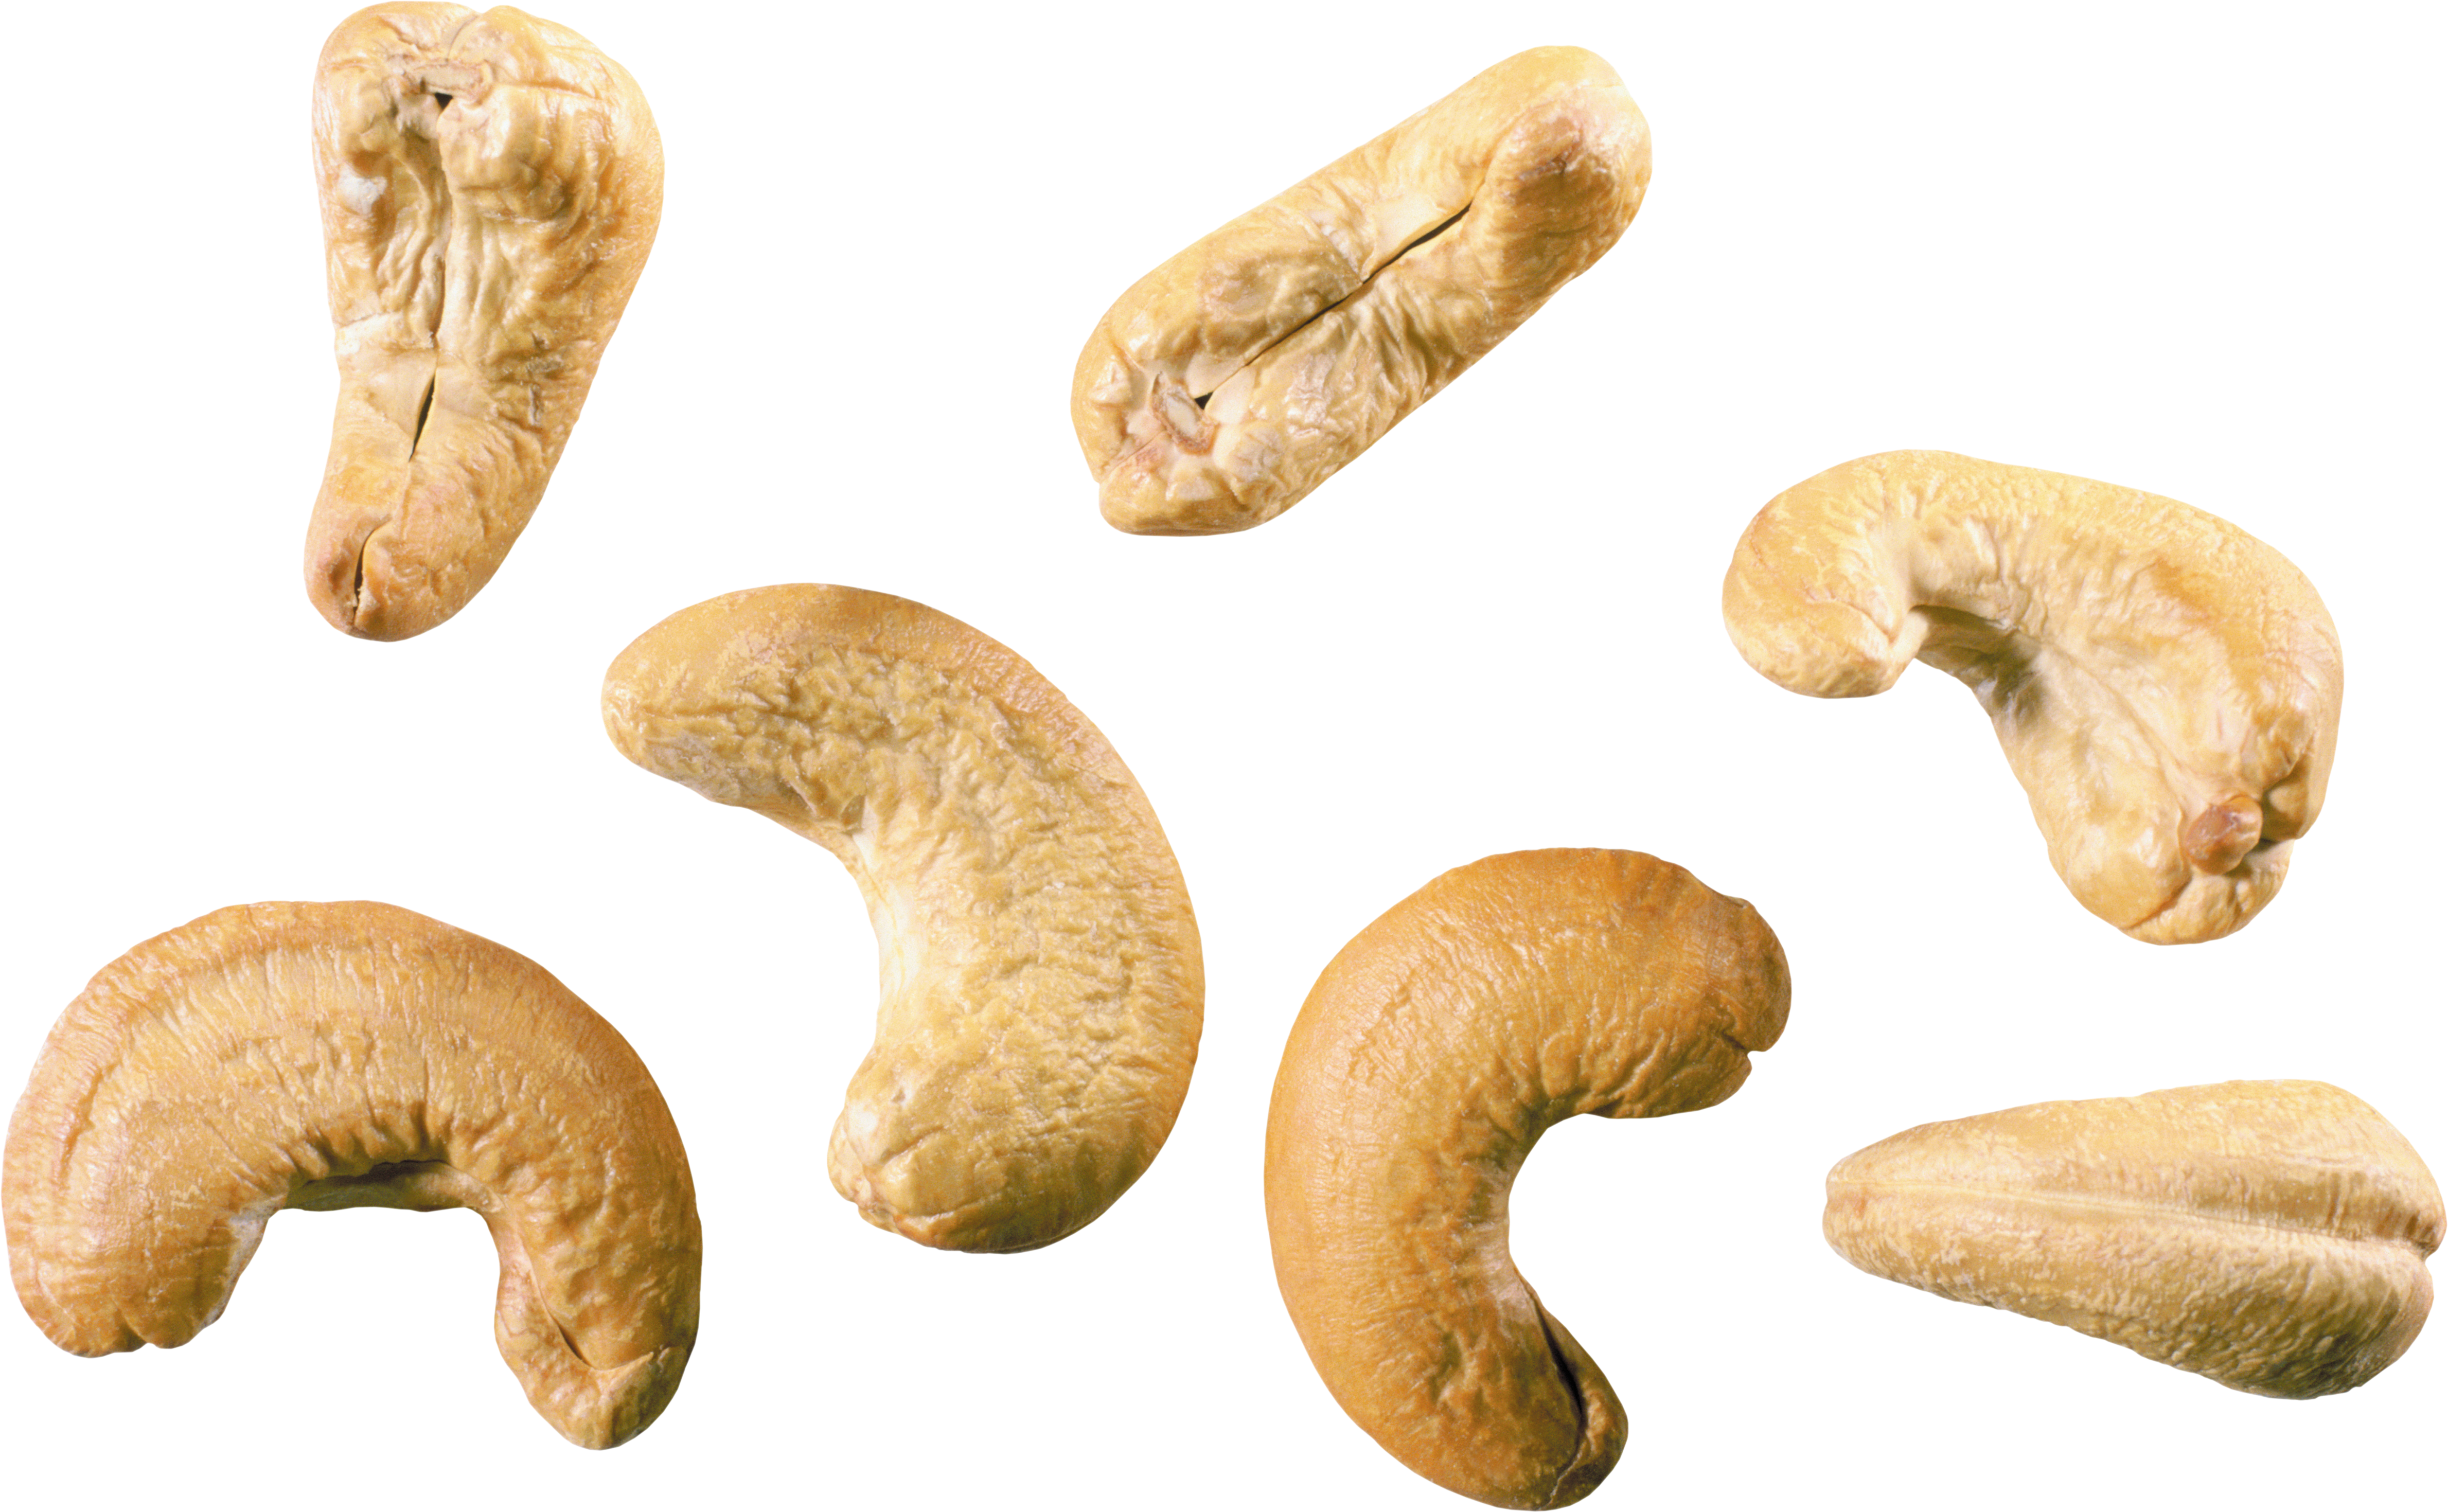 Scattered Cashews PNG Image